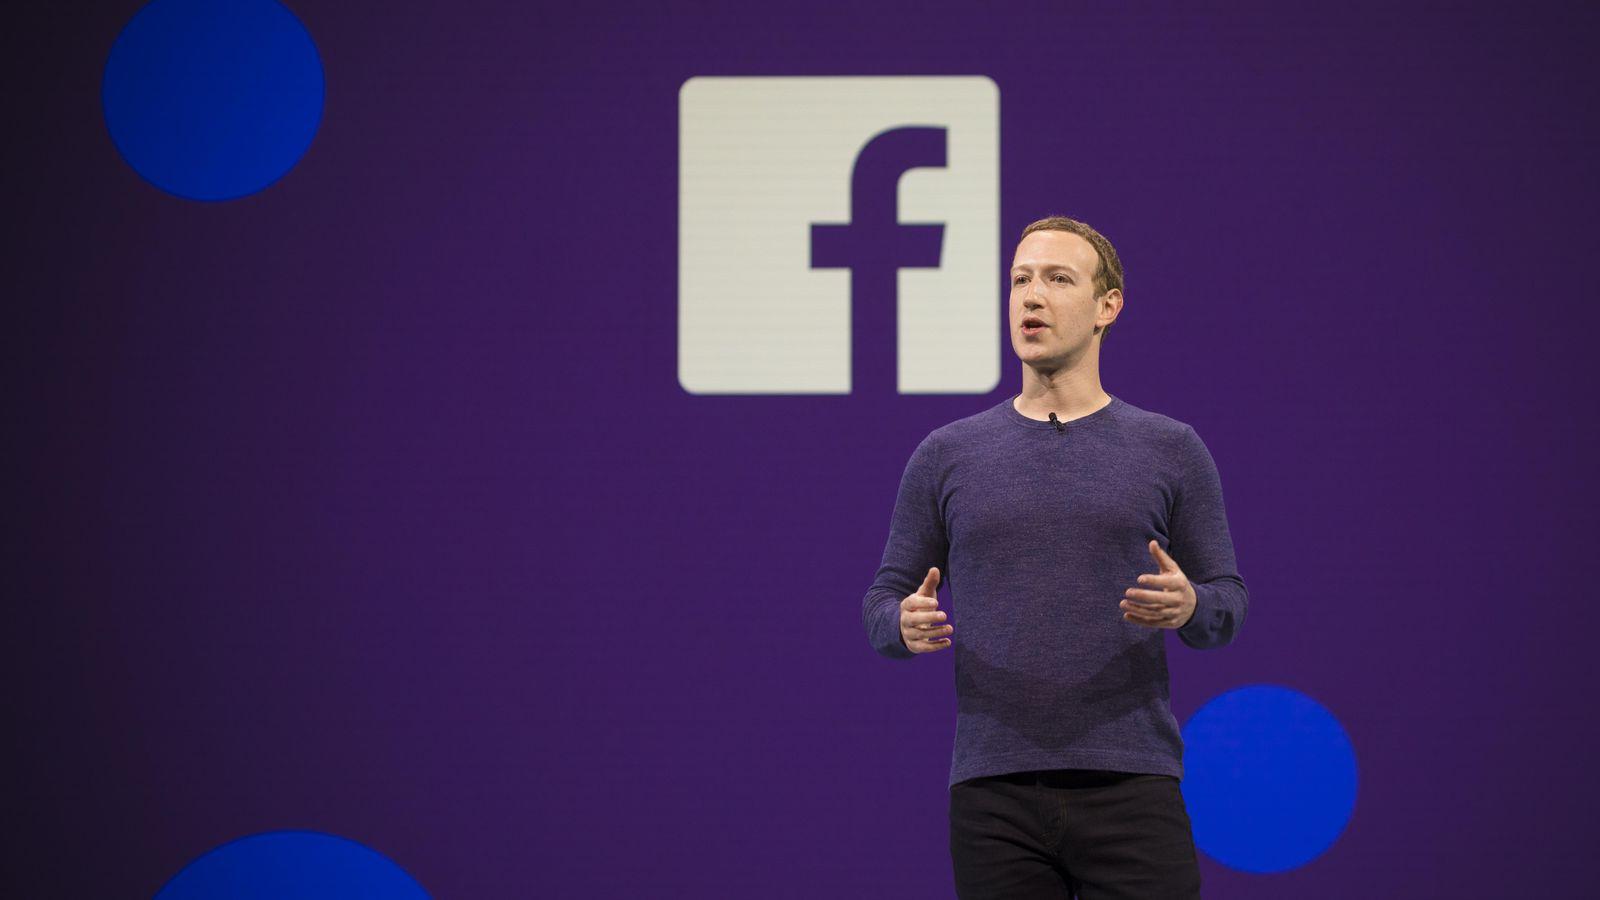 Facebook F8 2018: 5 Takeaways for Social Media Marketers